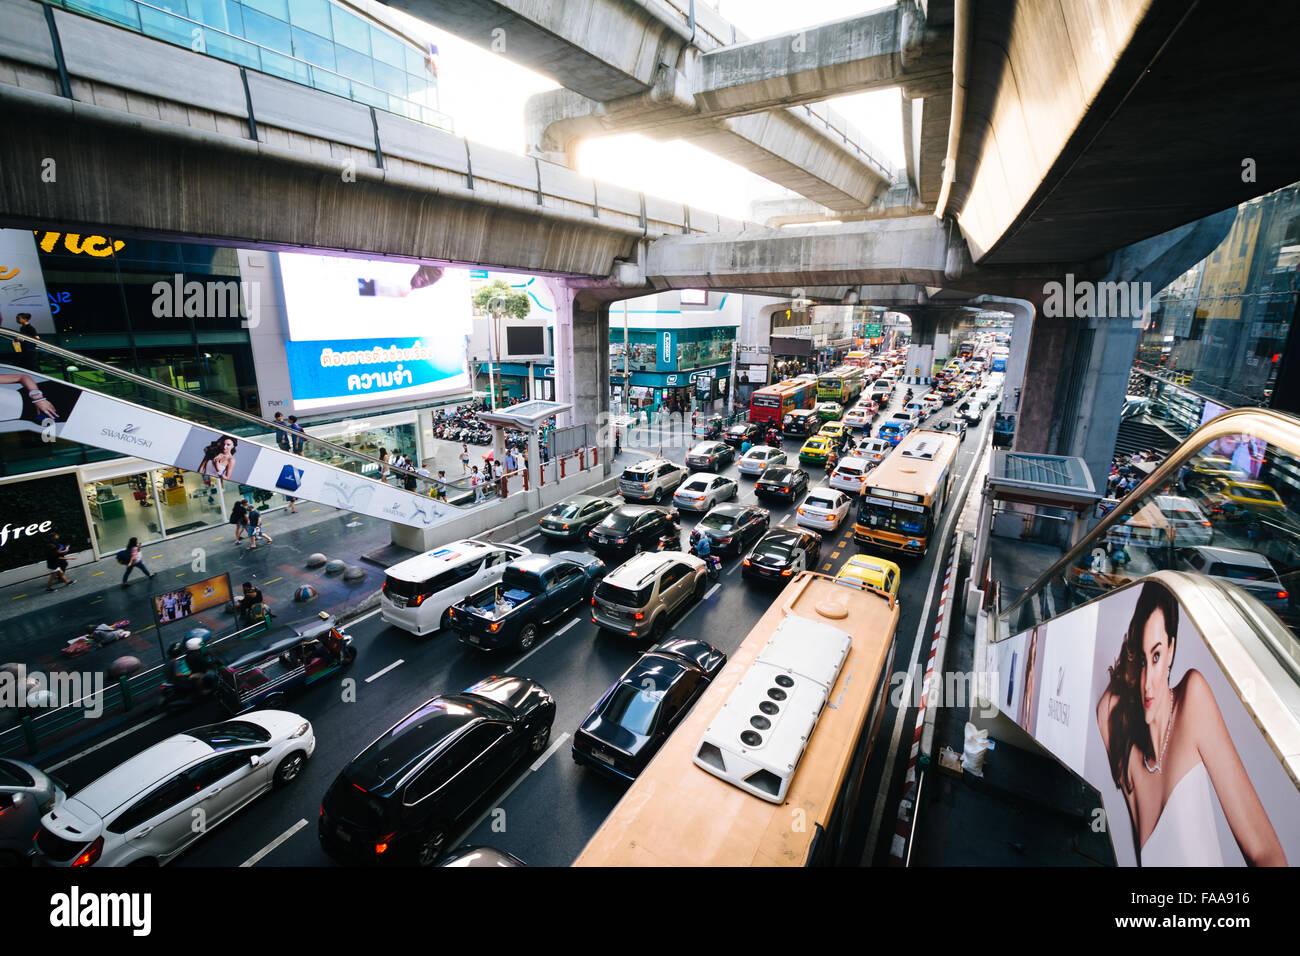 Traffic and skytrain tracks at Siam, in Bangkok, Thailand. - Stock Image